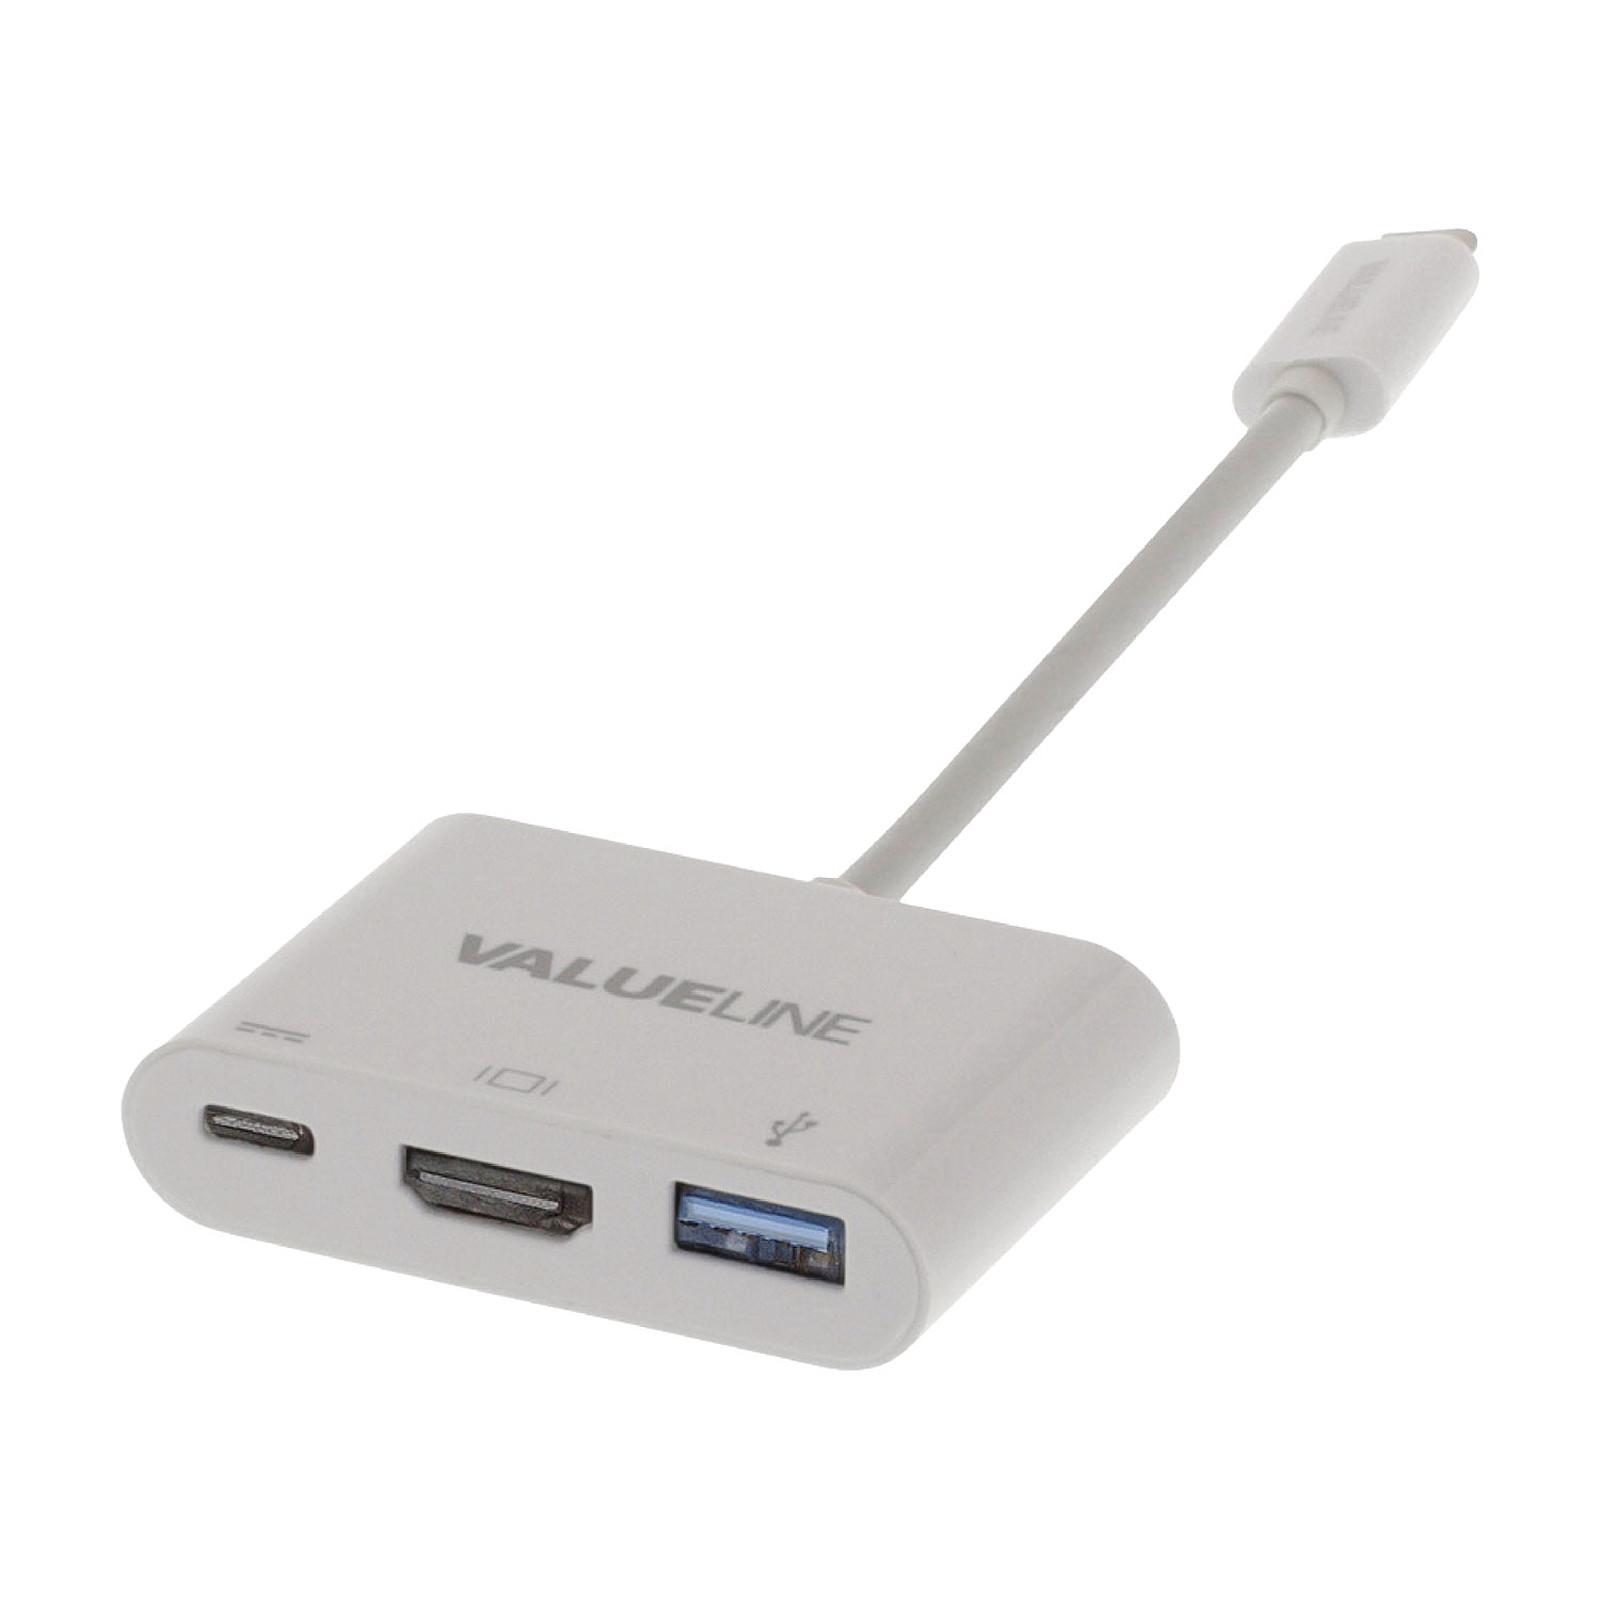 Valueline Adaptateur USB 3.1 vers USB / USB-C / HDMI